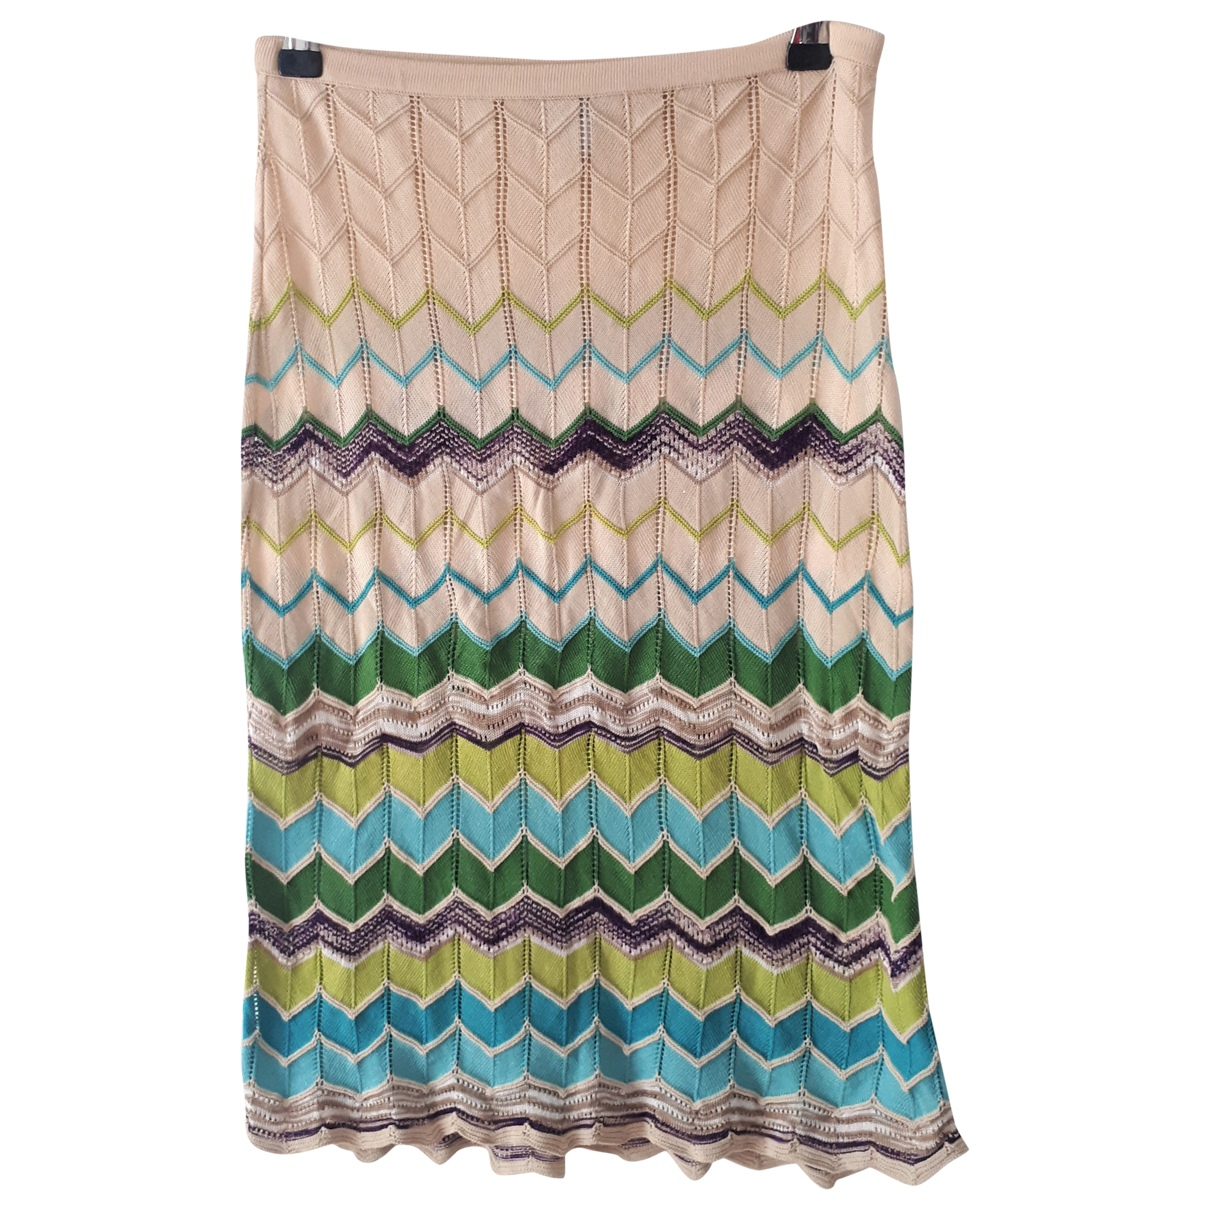 M Missoni \N Beige Cotton skirt for Women 42 IT